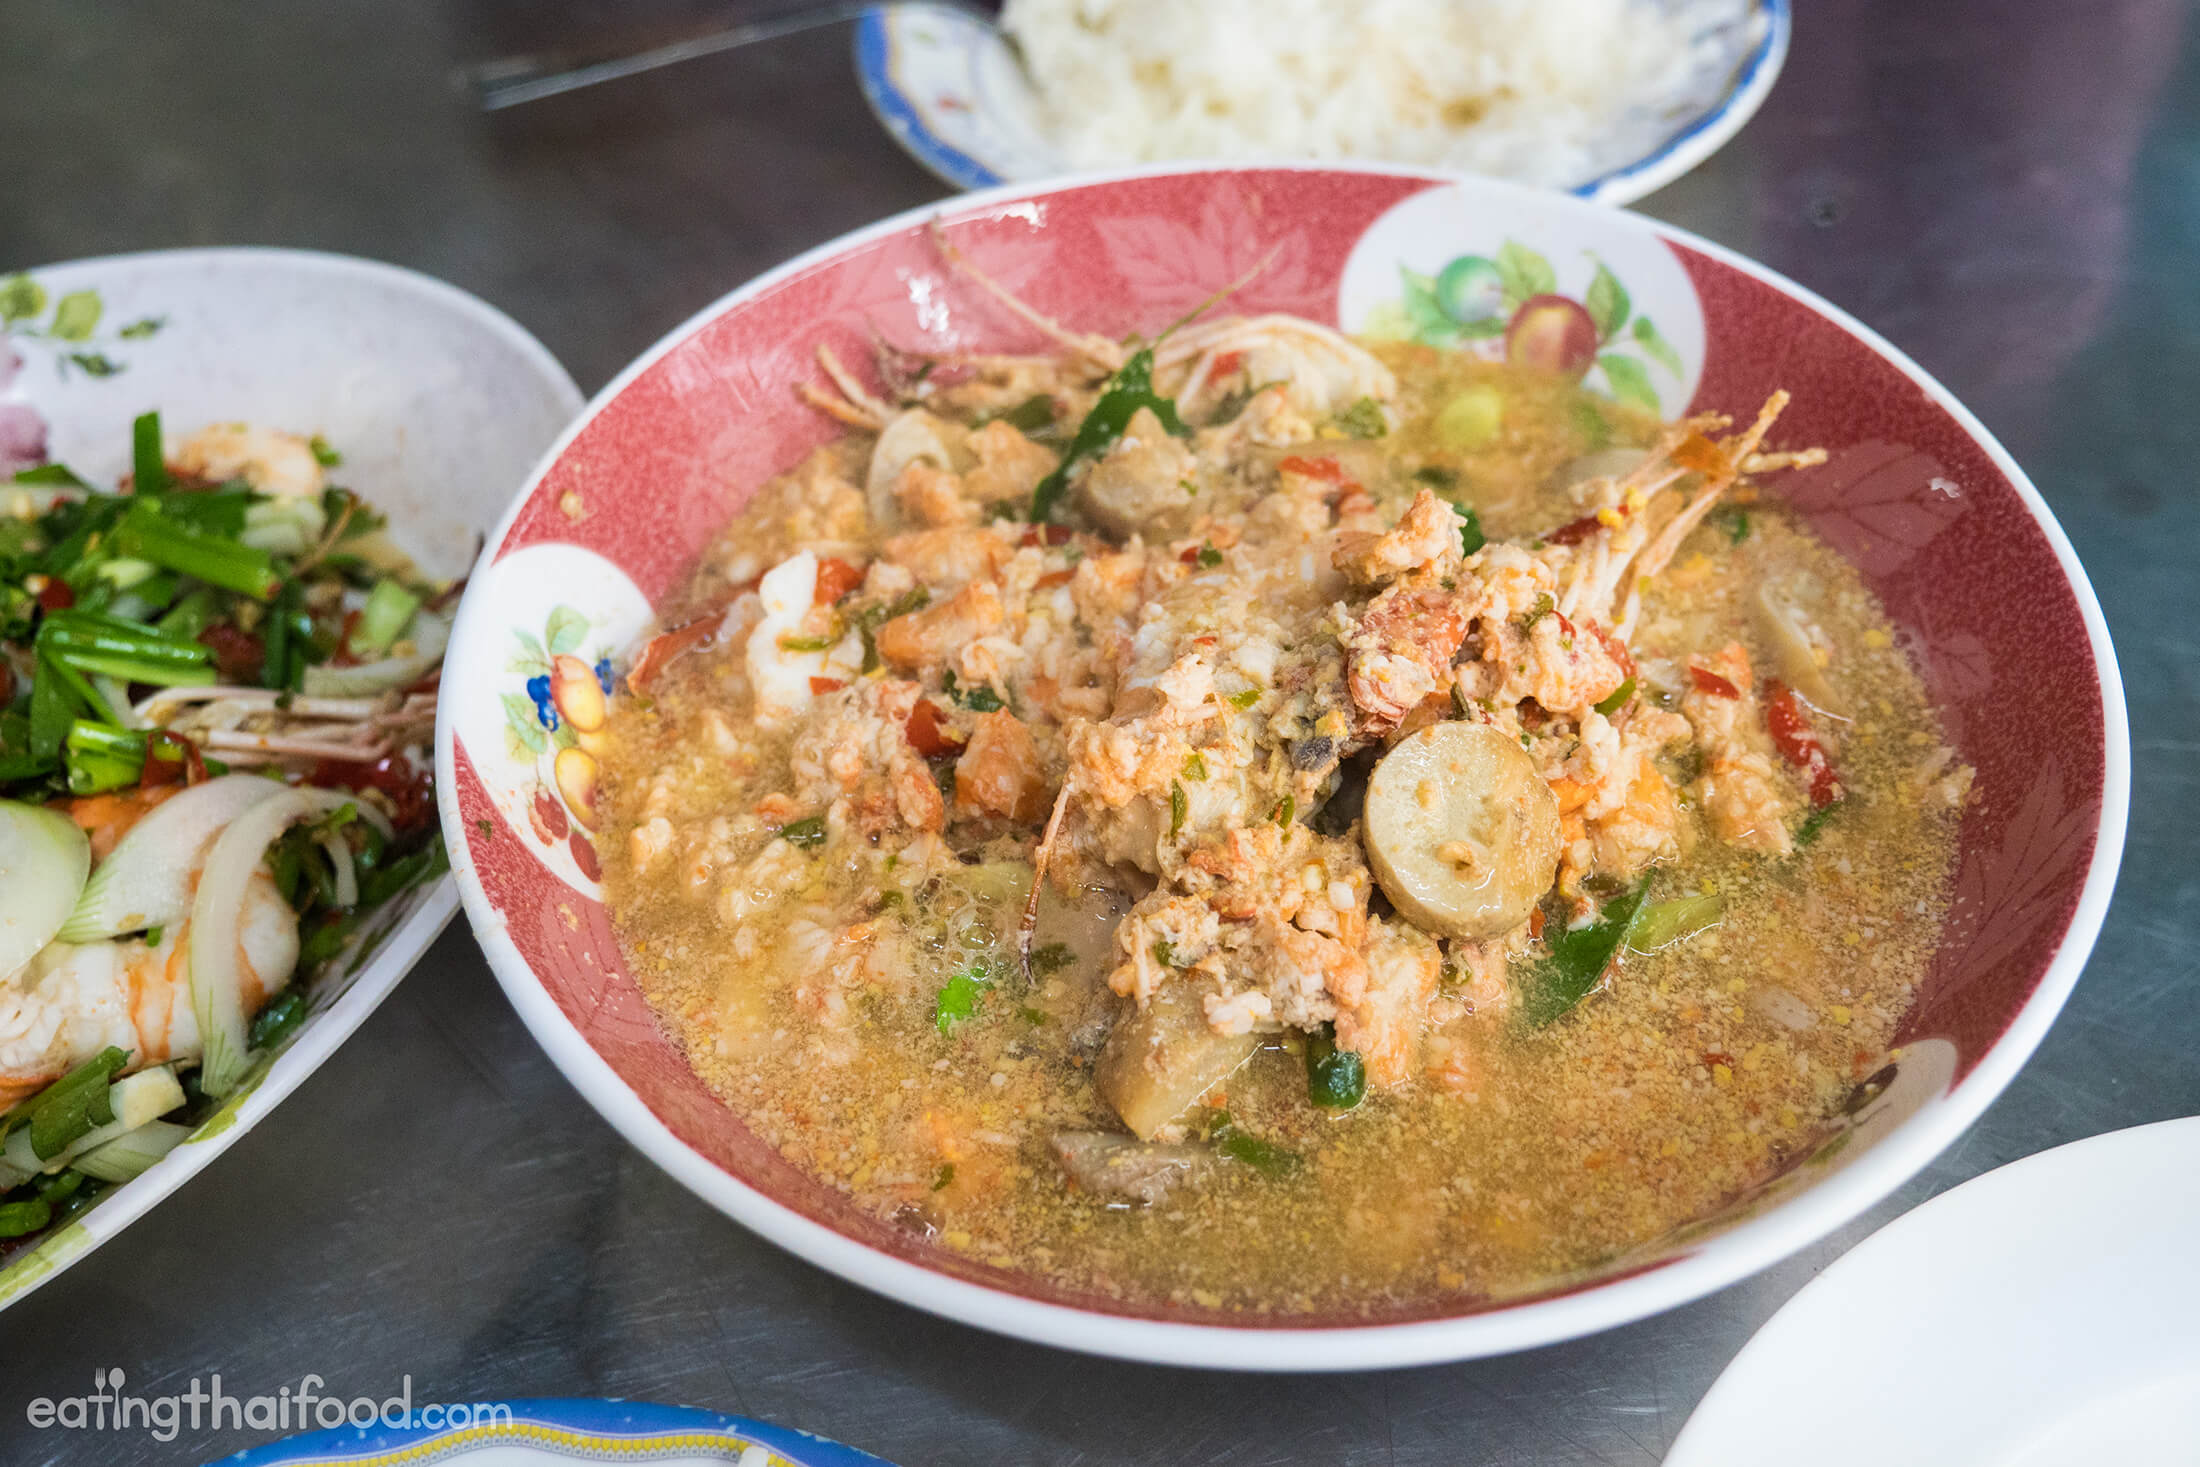 The Ultimate Street Food Tom Yum Goong in Bangkok (ร้านต้มยำกุ้งบางลำพู)